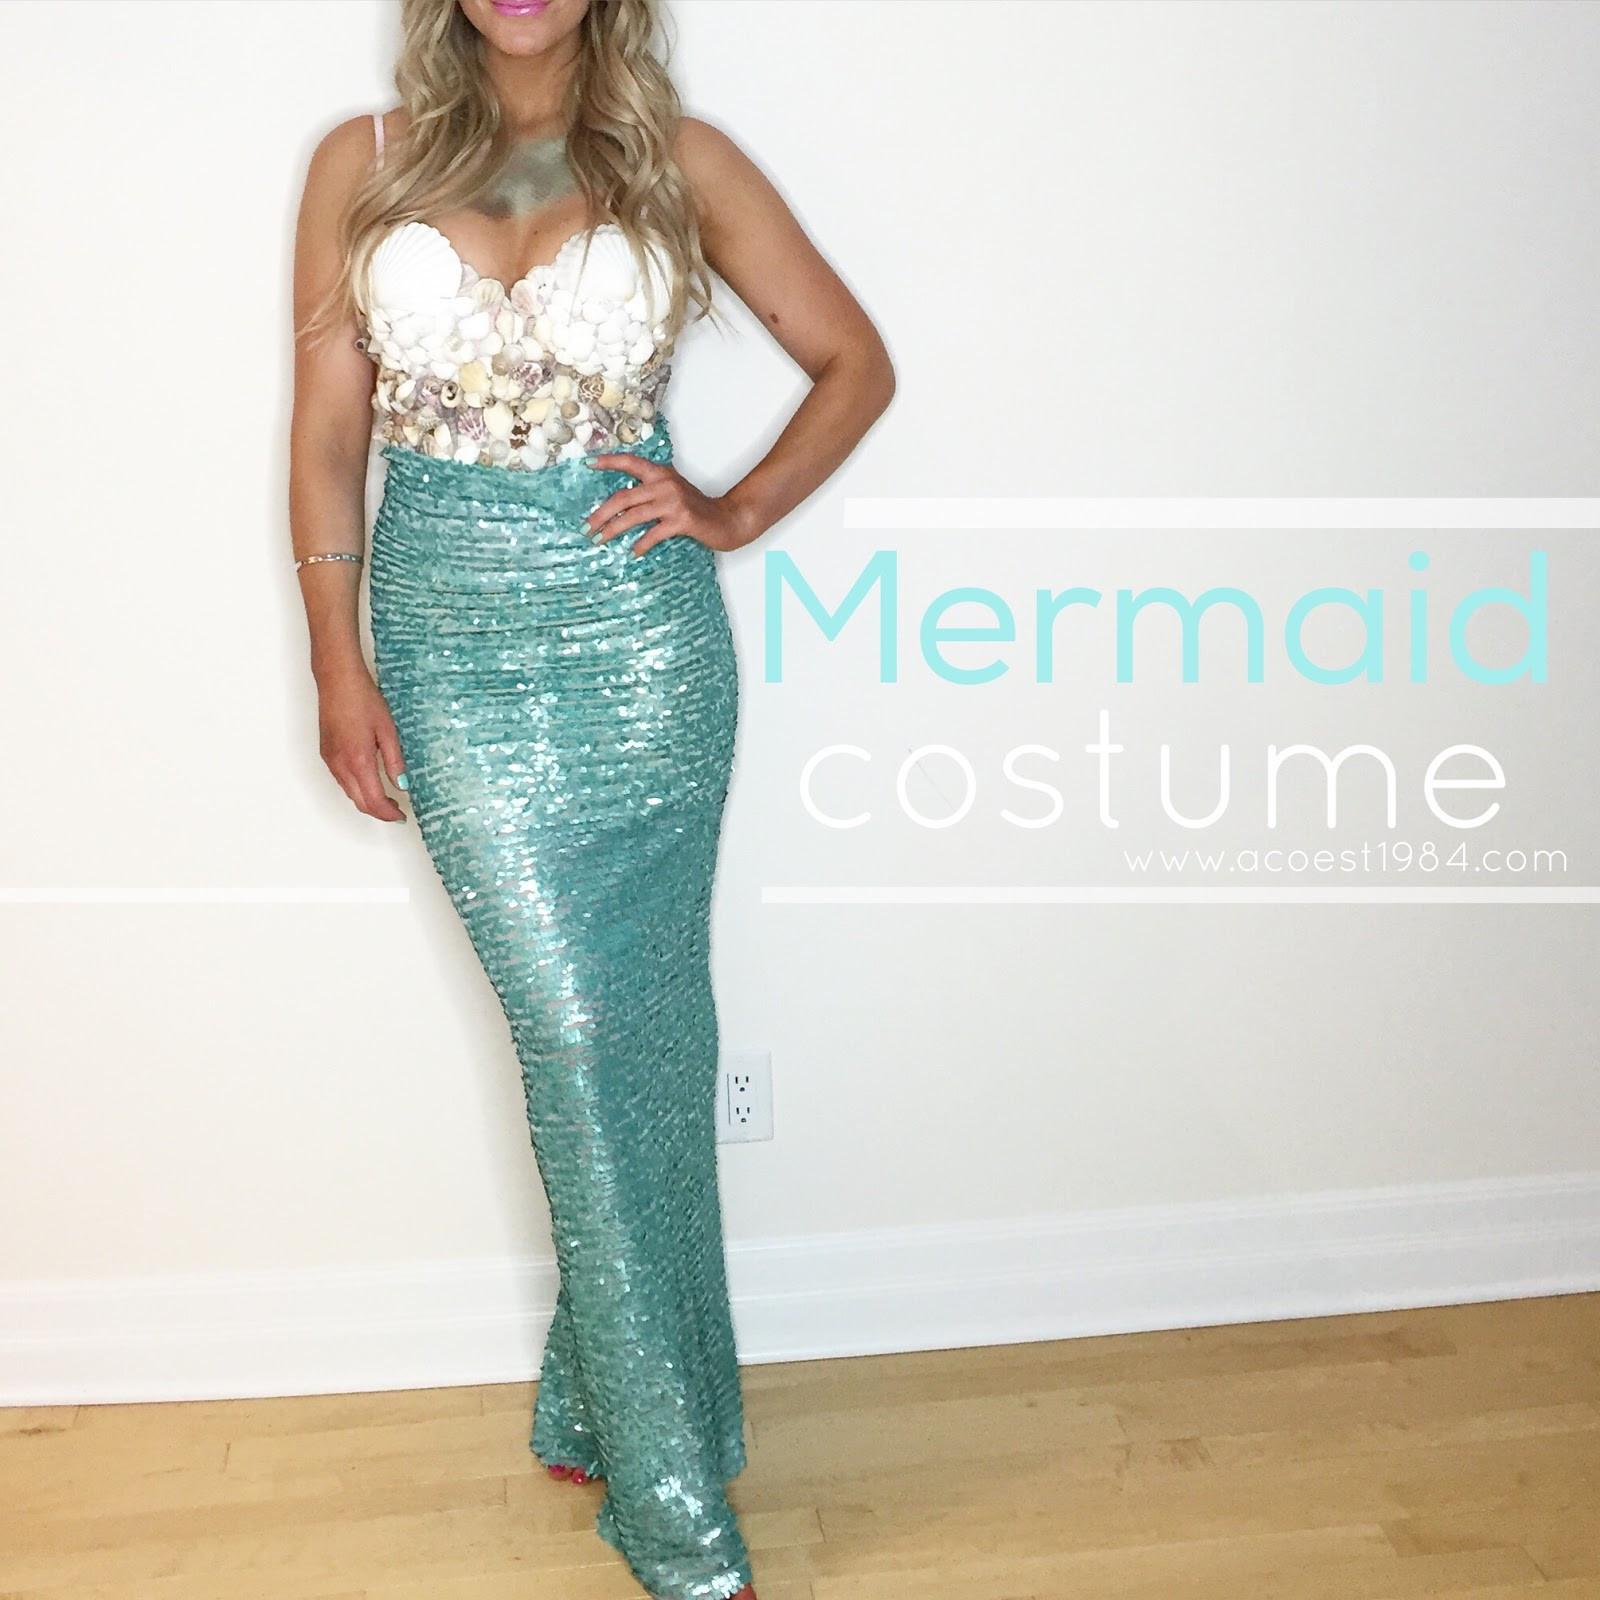 Mermaid Costume DIY  Inexpensive DIY Mermaid Costume